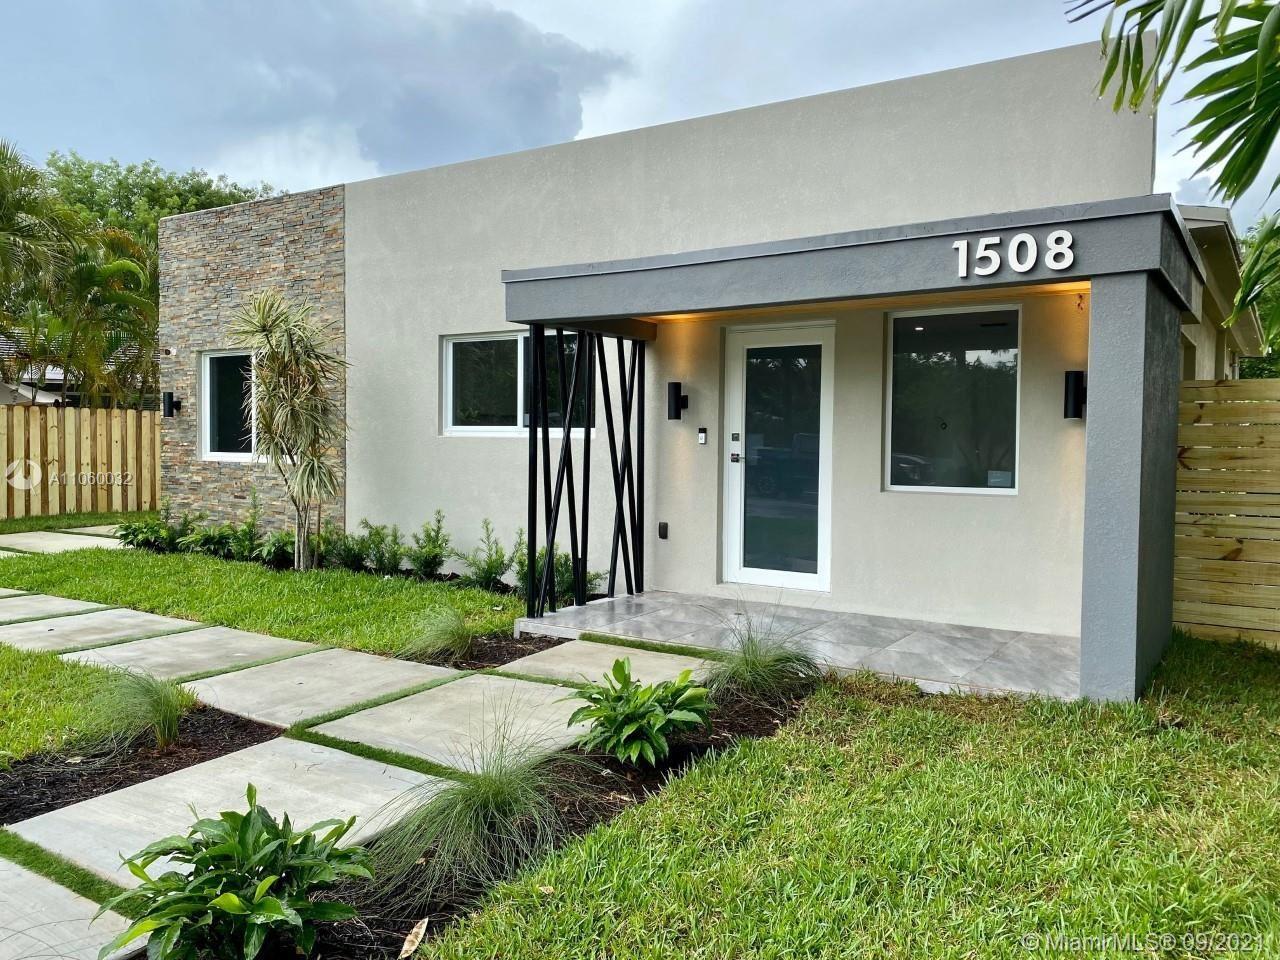 1508 NE 18th St, Fort Lauderdale, FL 33305 - #: A11060032